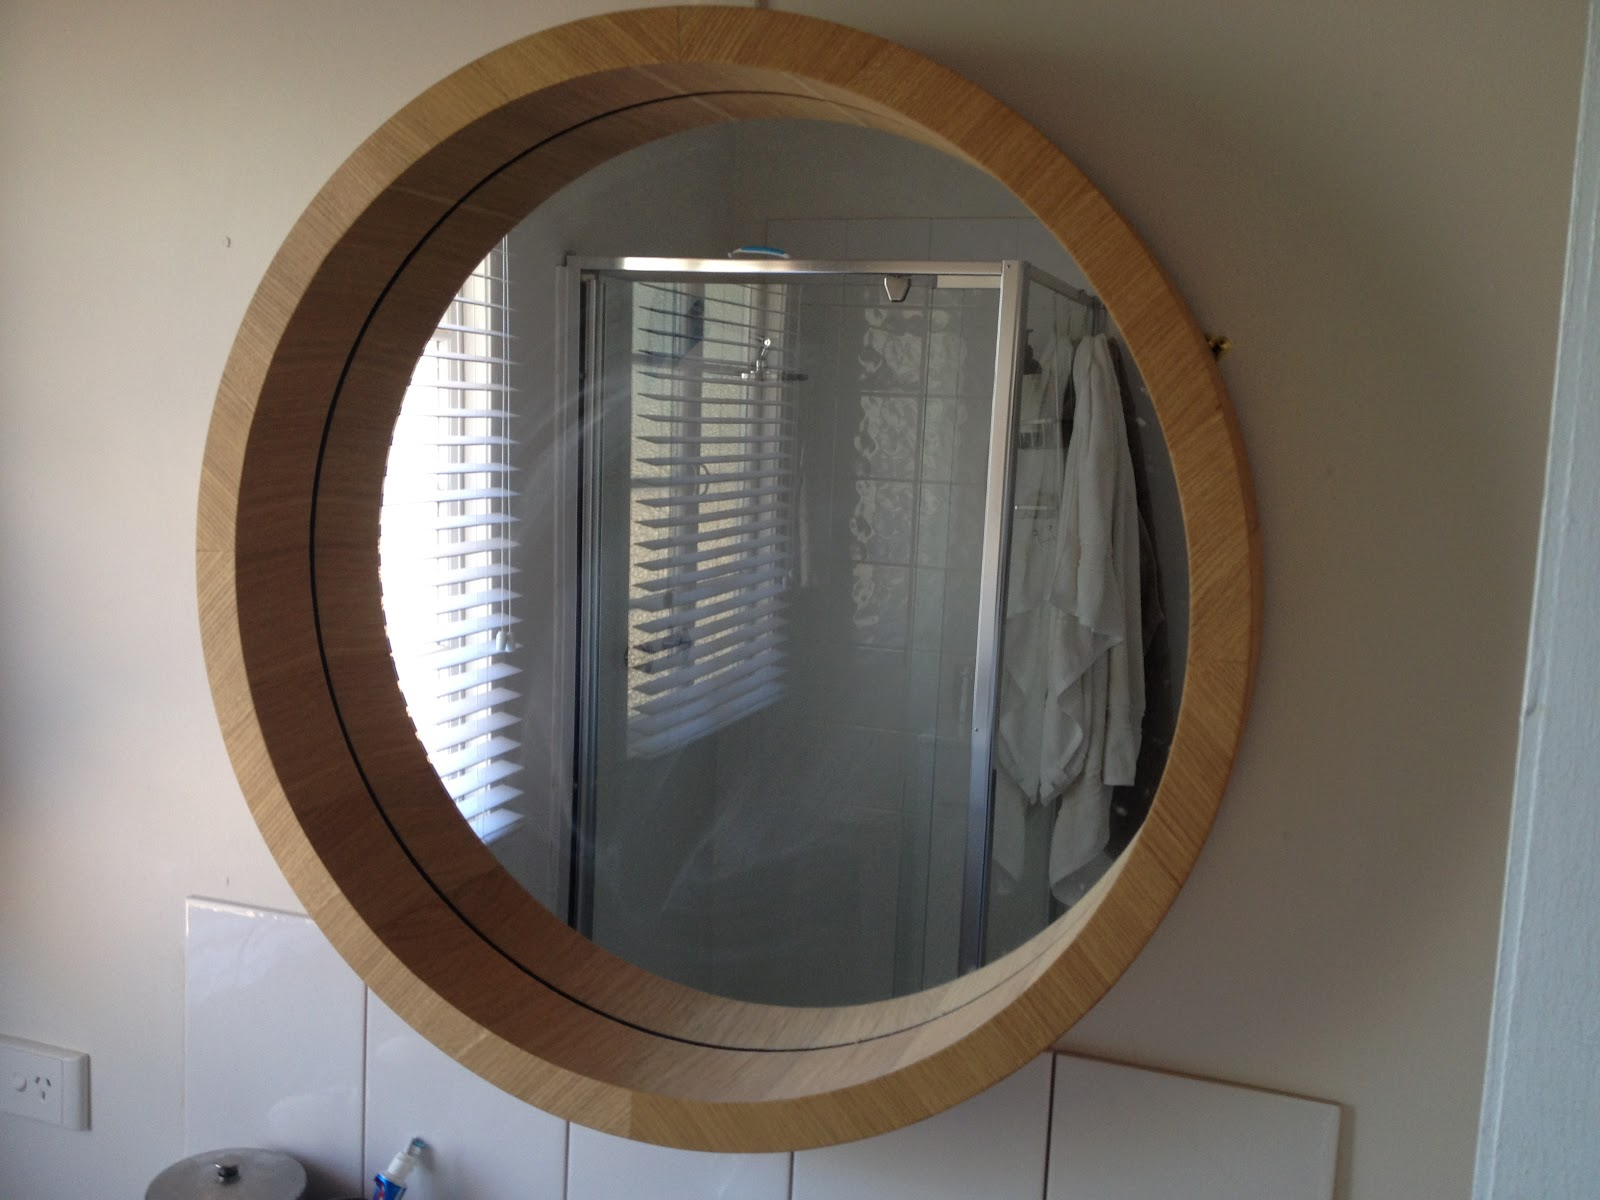 Perfect Sunny Round Illuminated Mirror Buy Online At Bathroom City